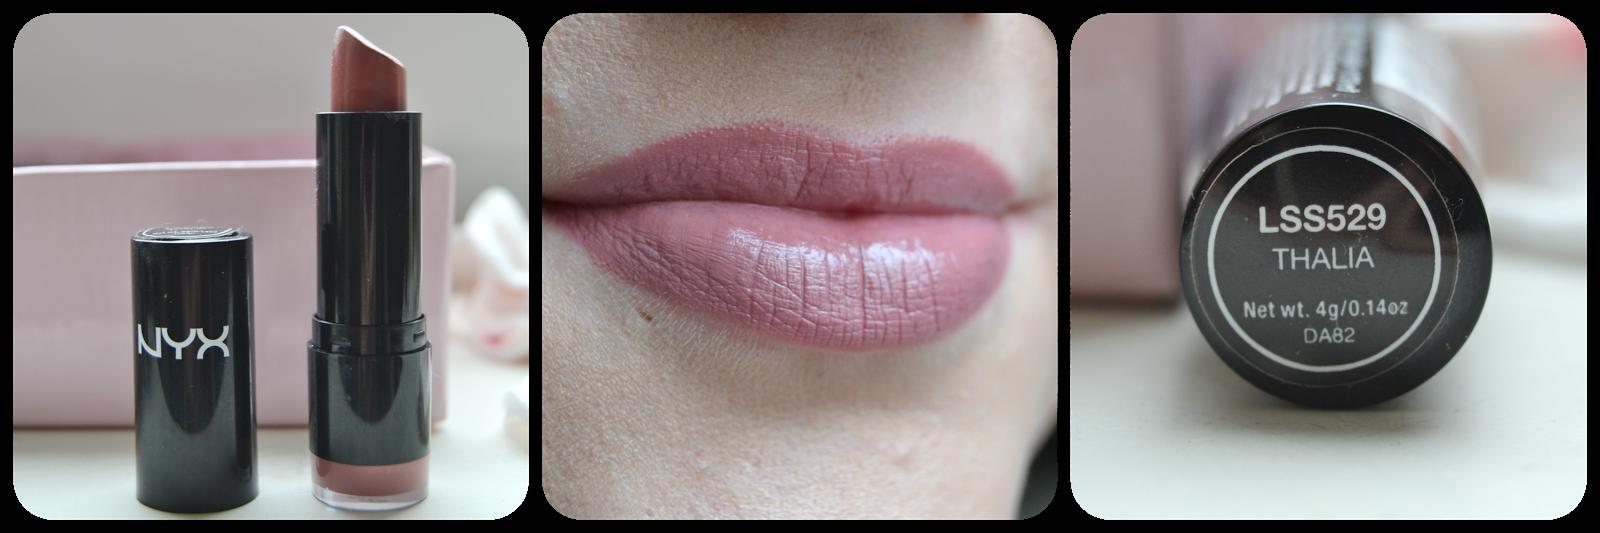 NYX Cosmetics Lipstick Lippenstift Round Lipstick Swatch Thalia